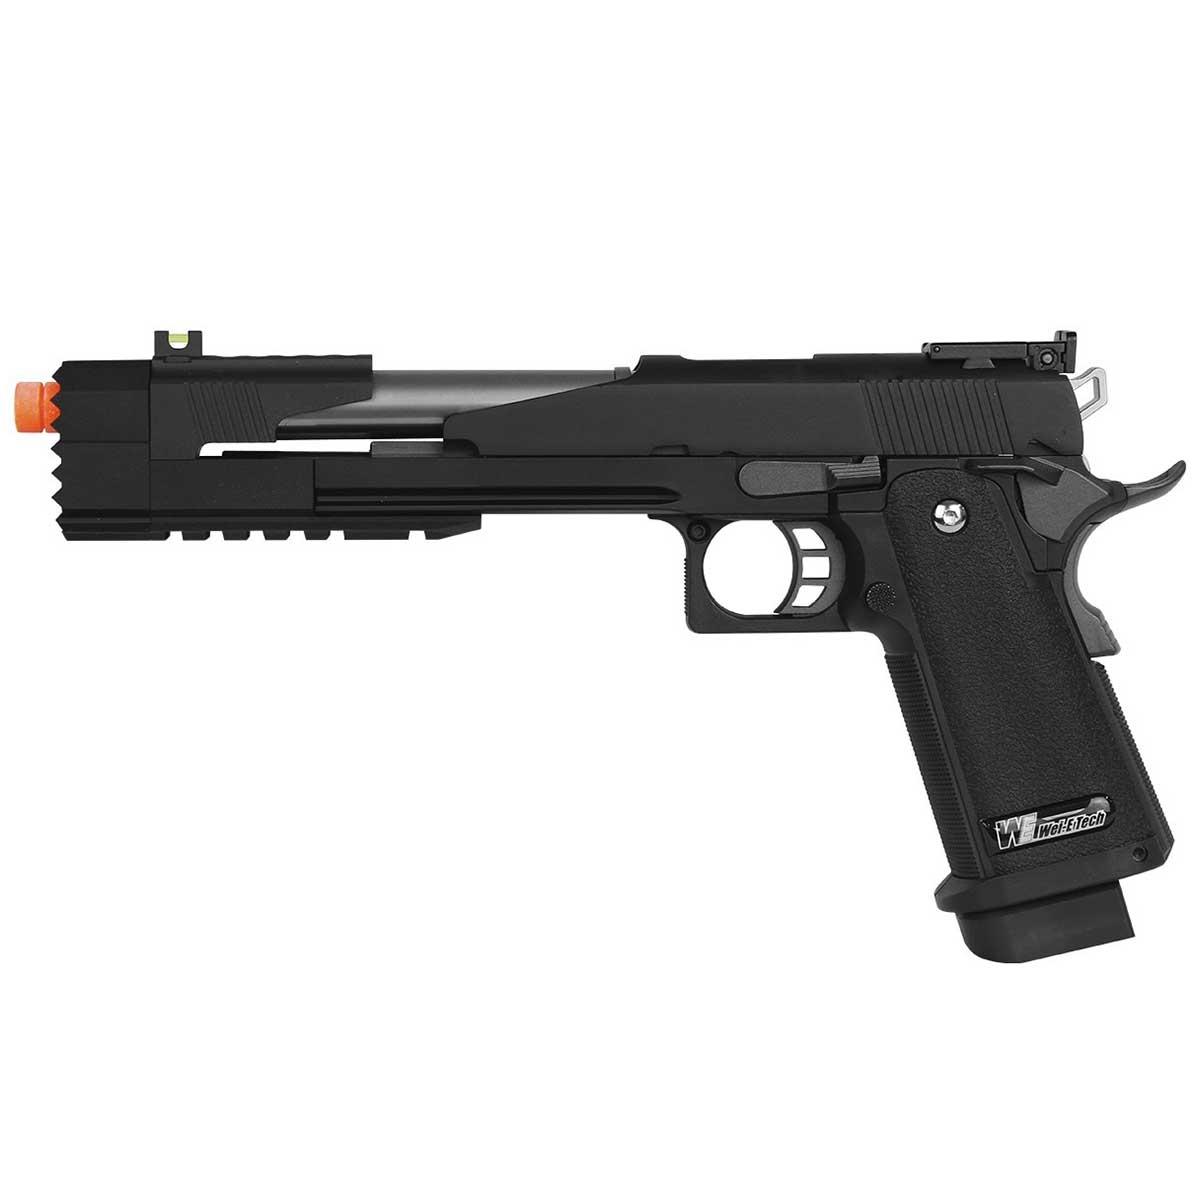 Pistola Airsoft GBB WE 1911 Black Dragon 7.0 A Full Metal 6mm